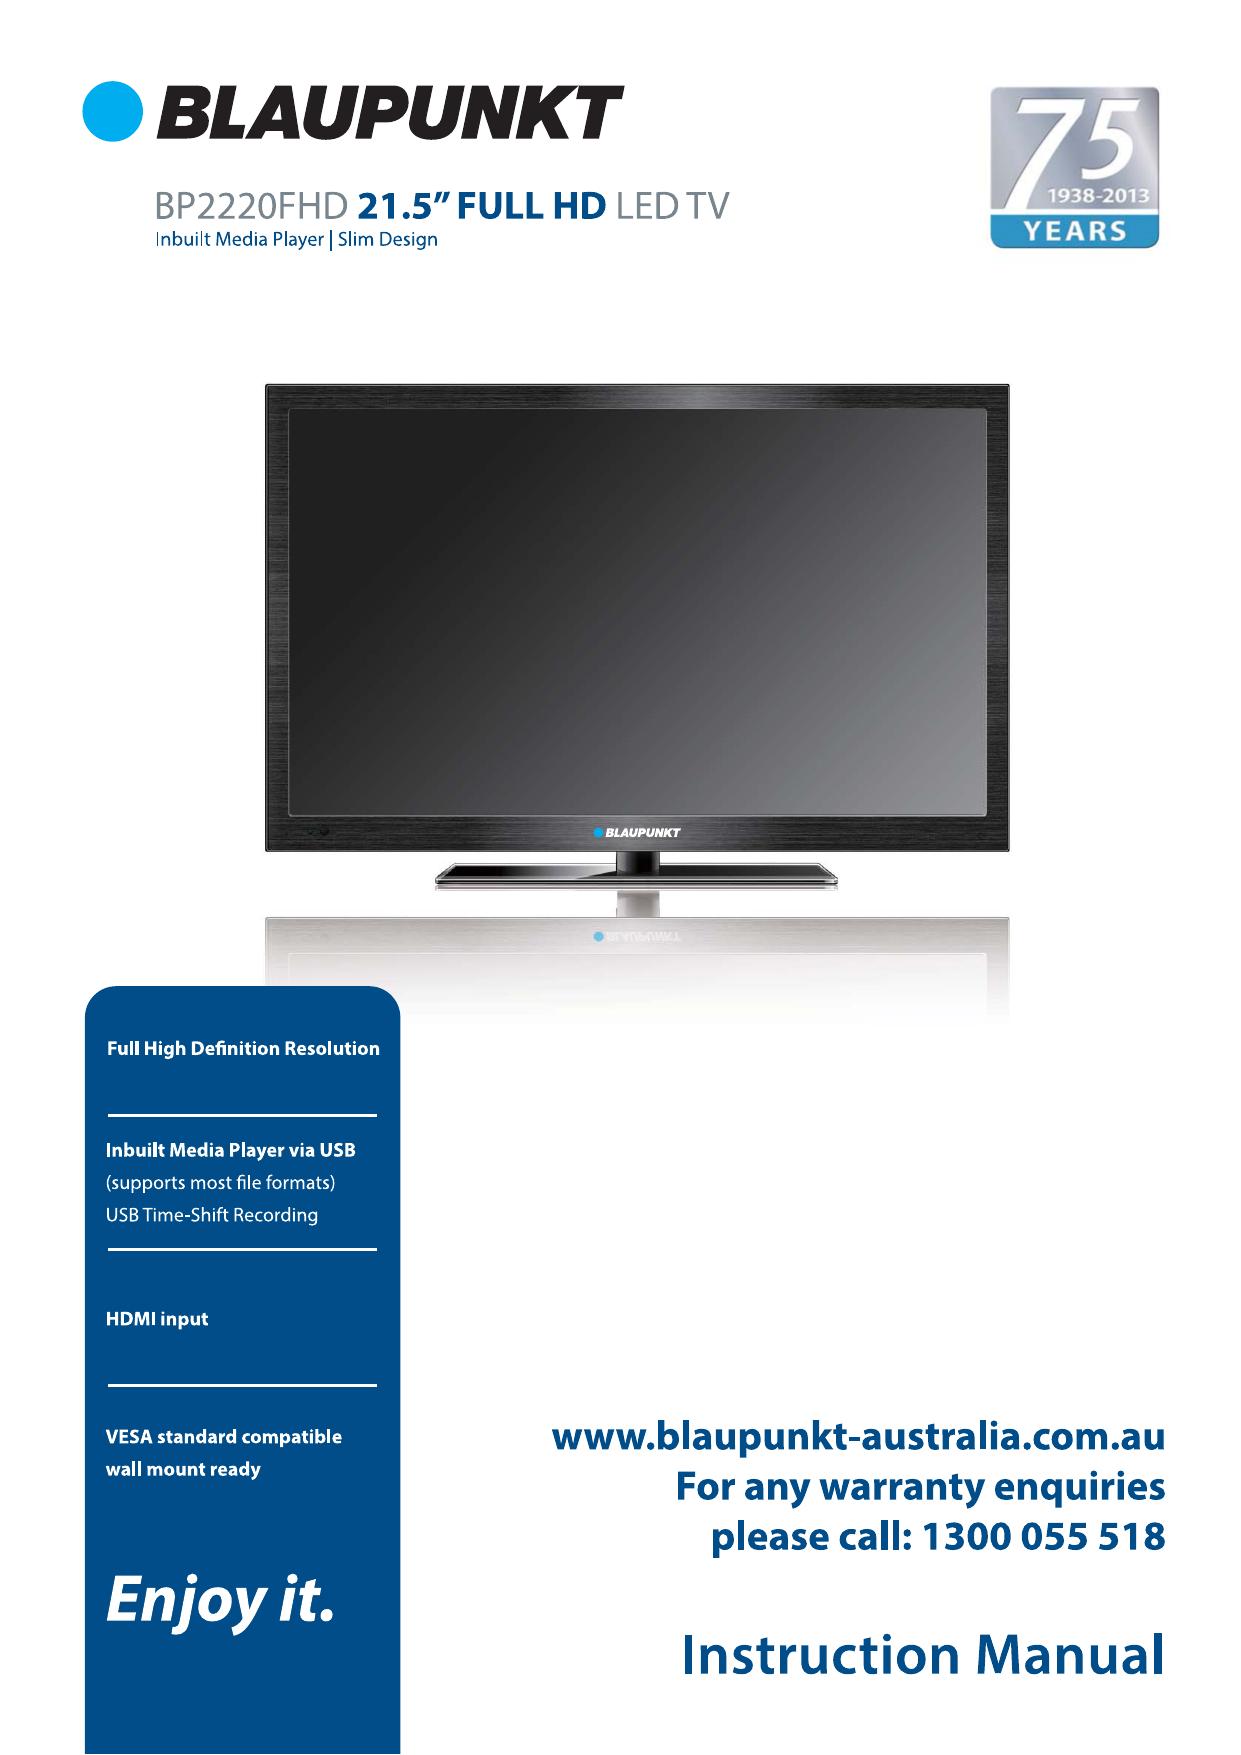 BP2220FHD - Blaupunkt Australia | manualzz com